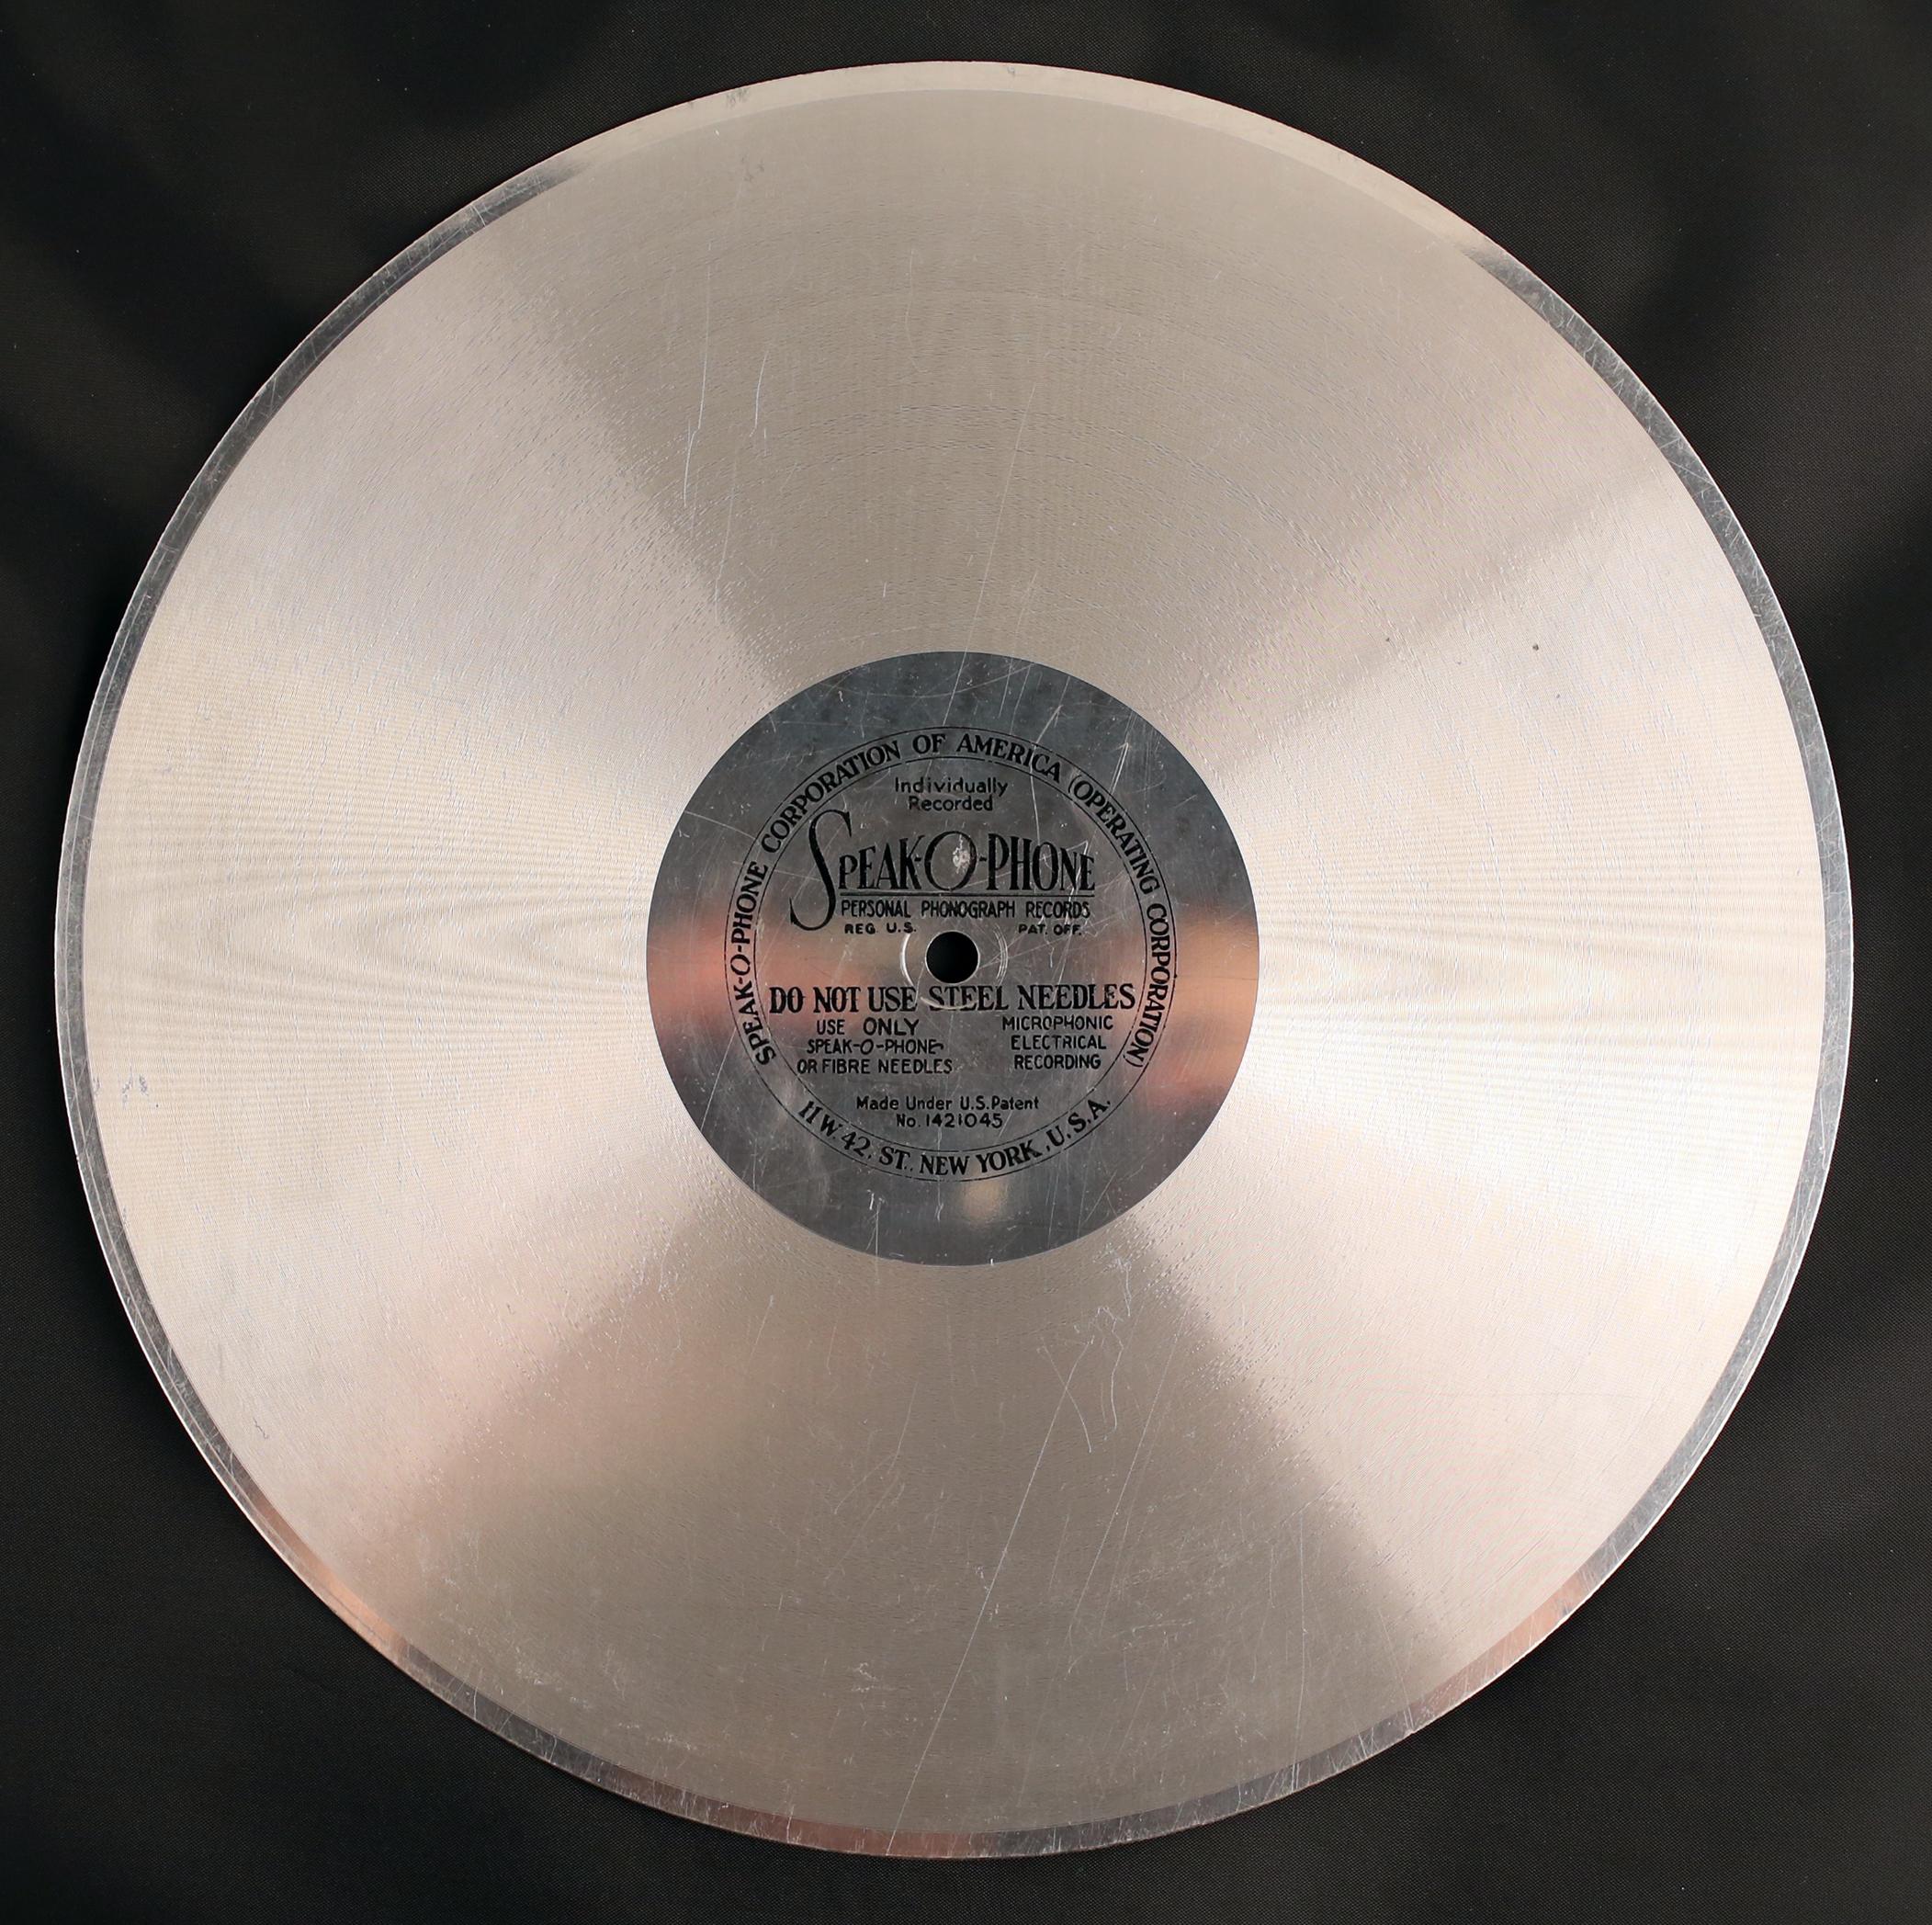 Uncoated Aluminum